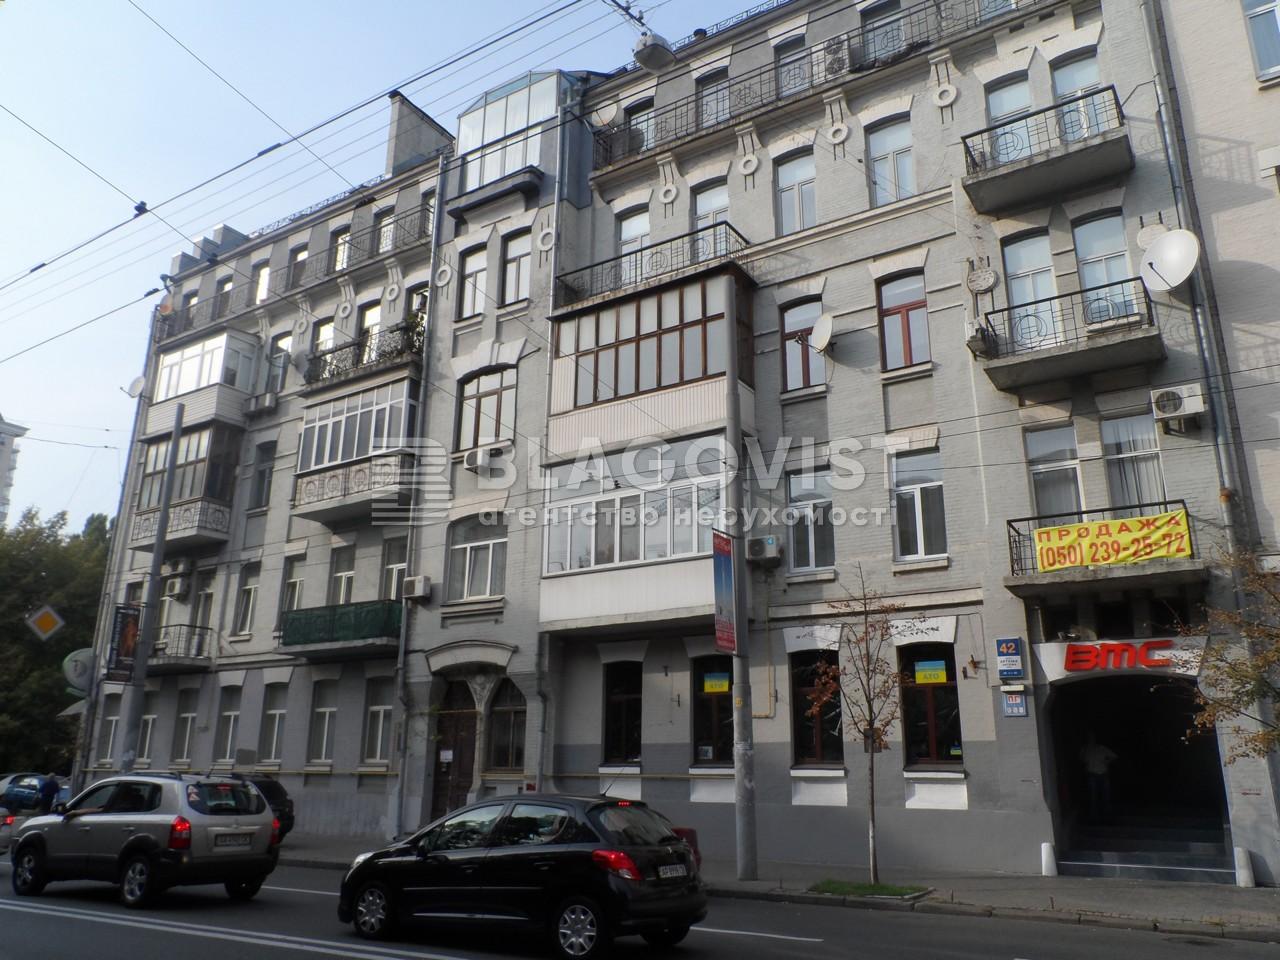 Квартира F-37098, Сечевых Стрельцов (Артема), 42, Киев - Фото 2